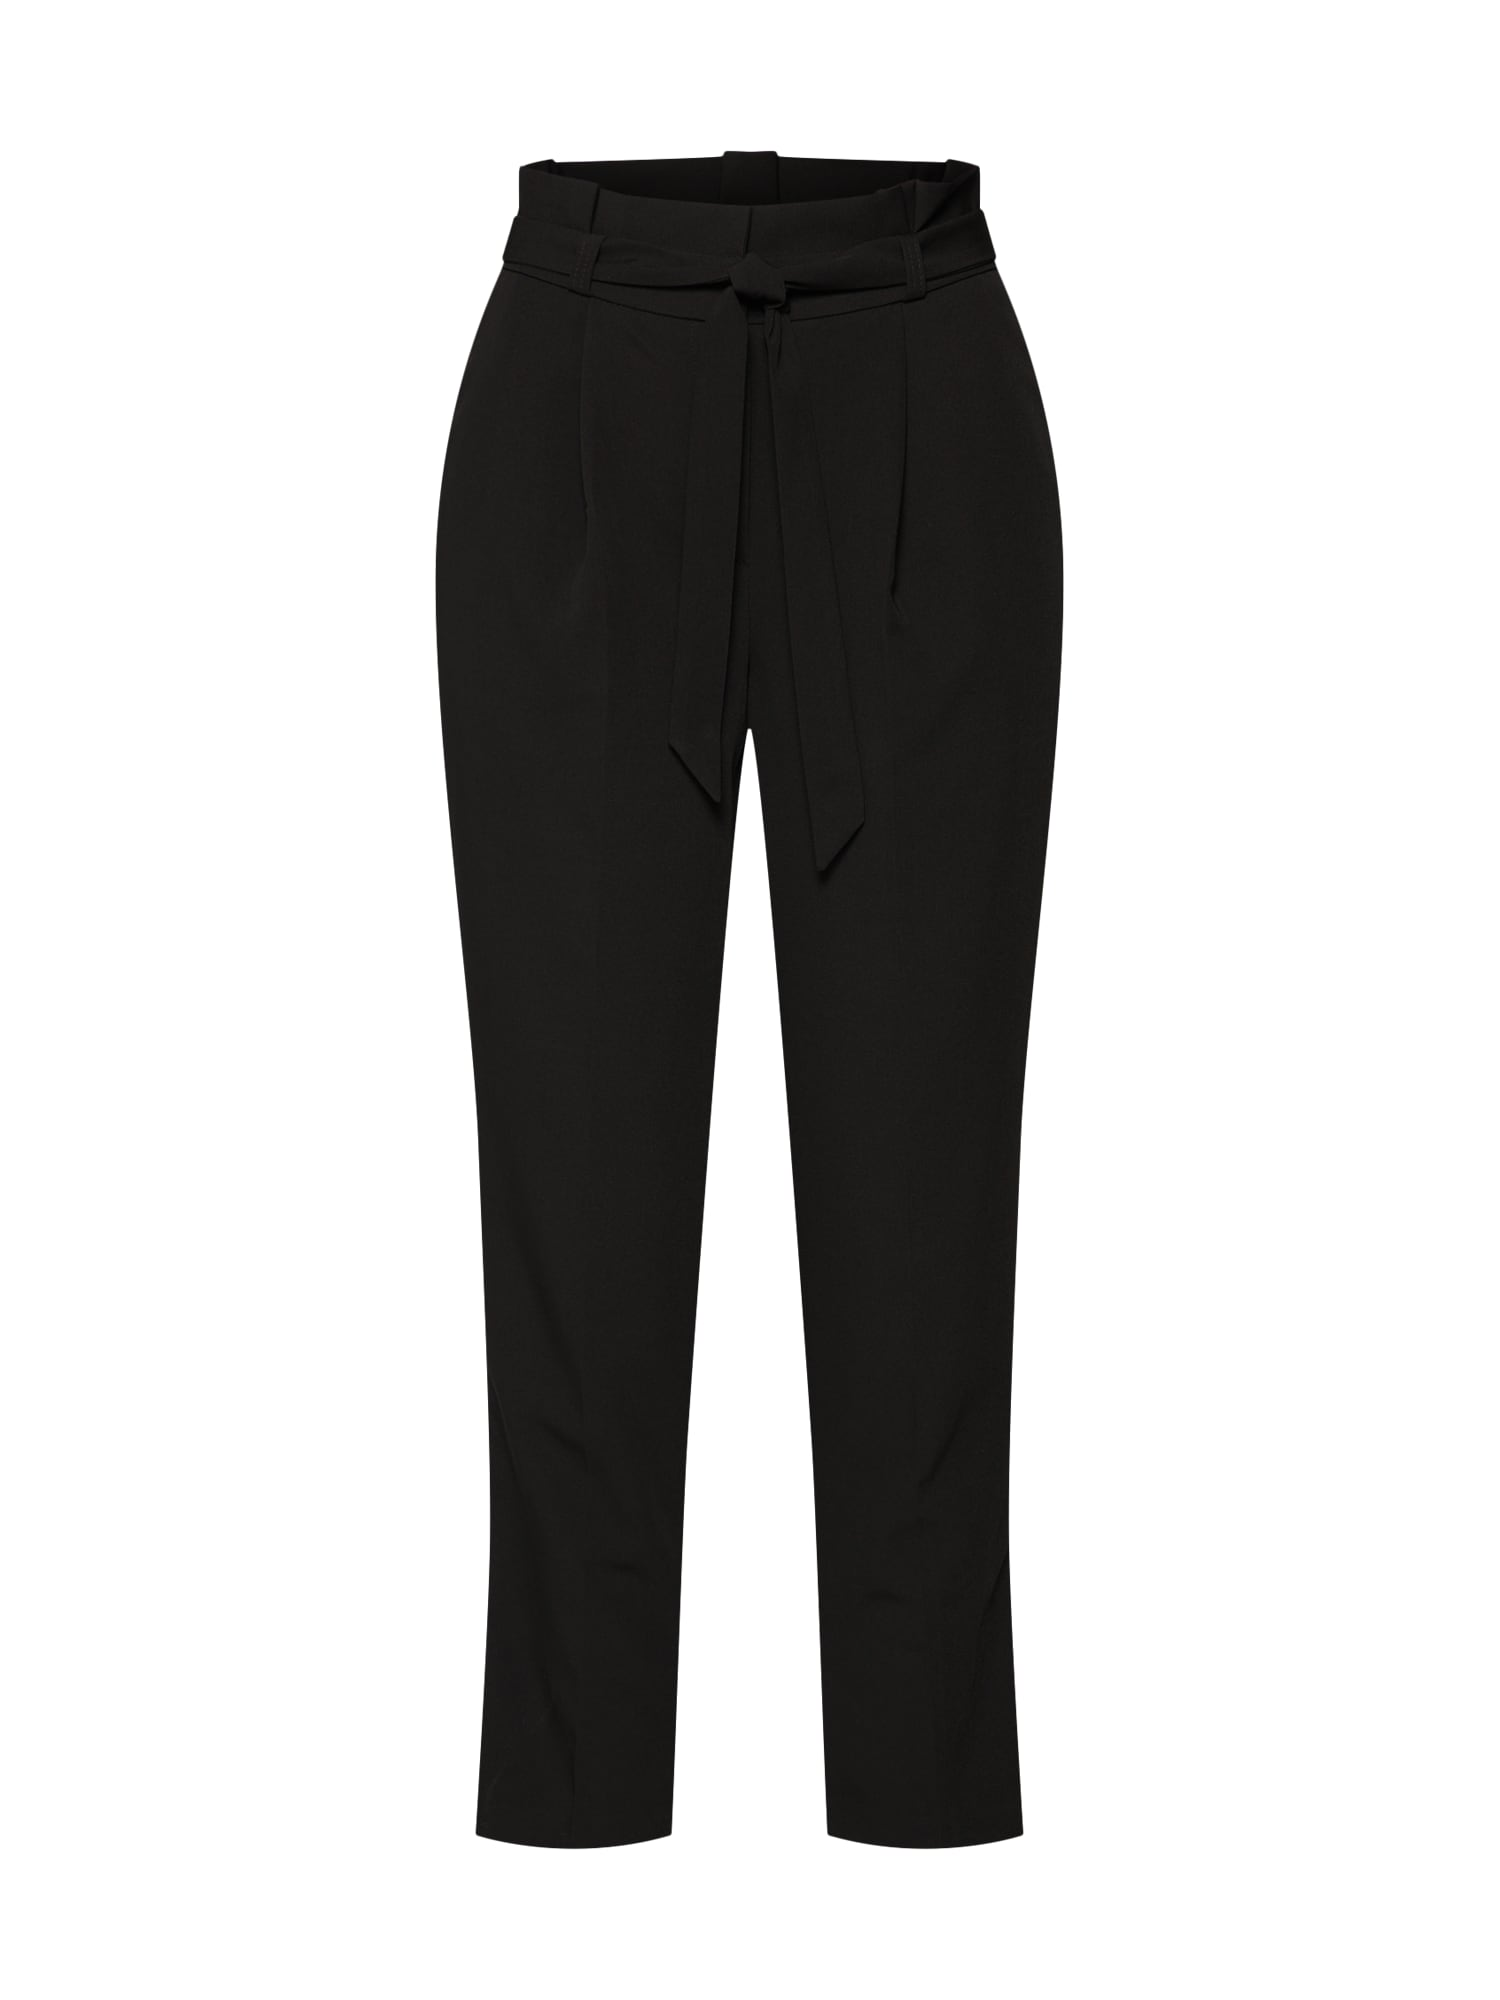 Kalhoty 25.05 WW NAPLES PIPED SIDE OLIVIA TRS P178 černá NEW LOOK